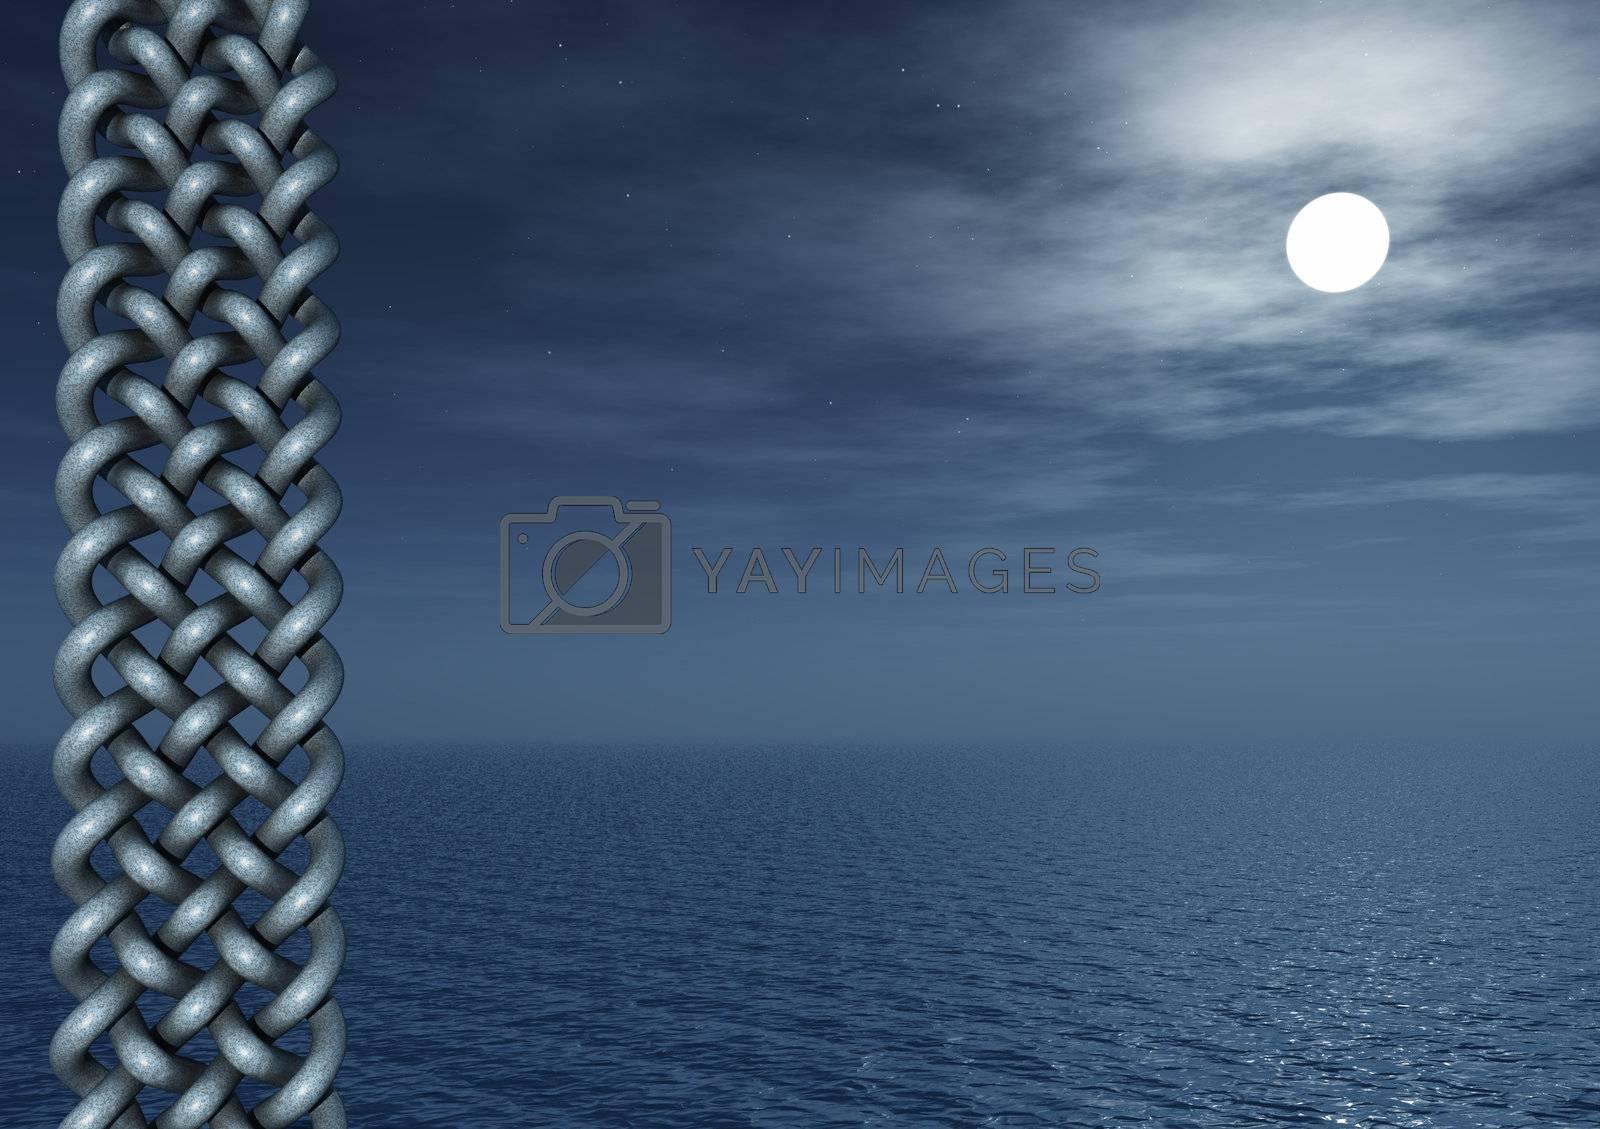 celtic art and water landscape at night - 3d illustration